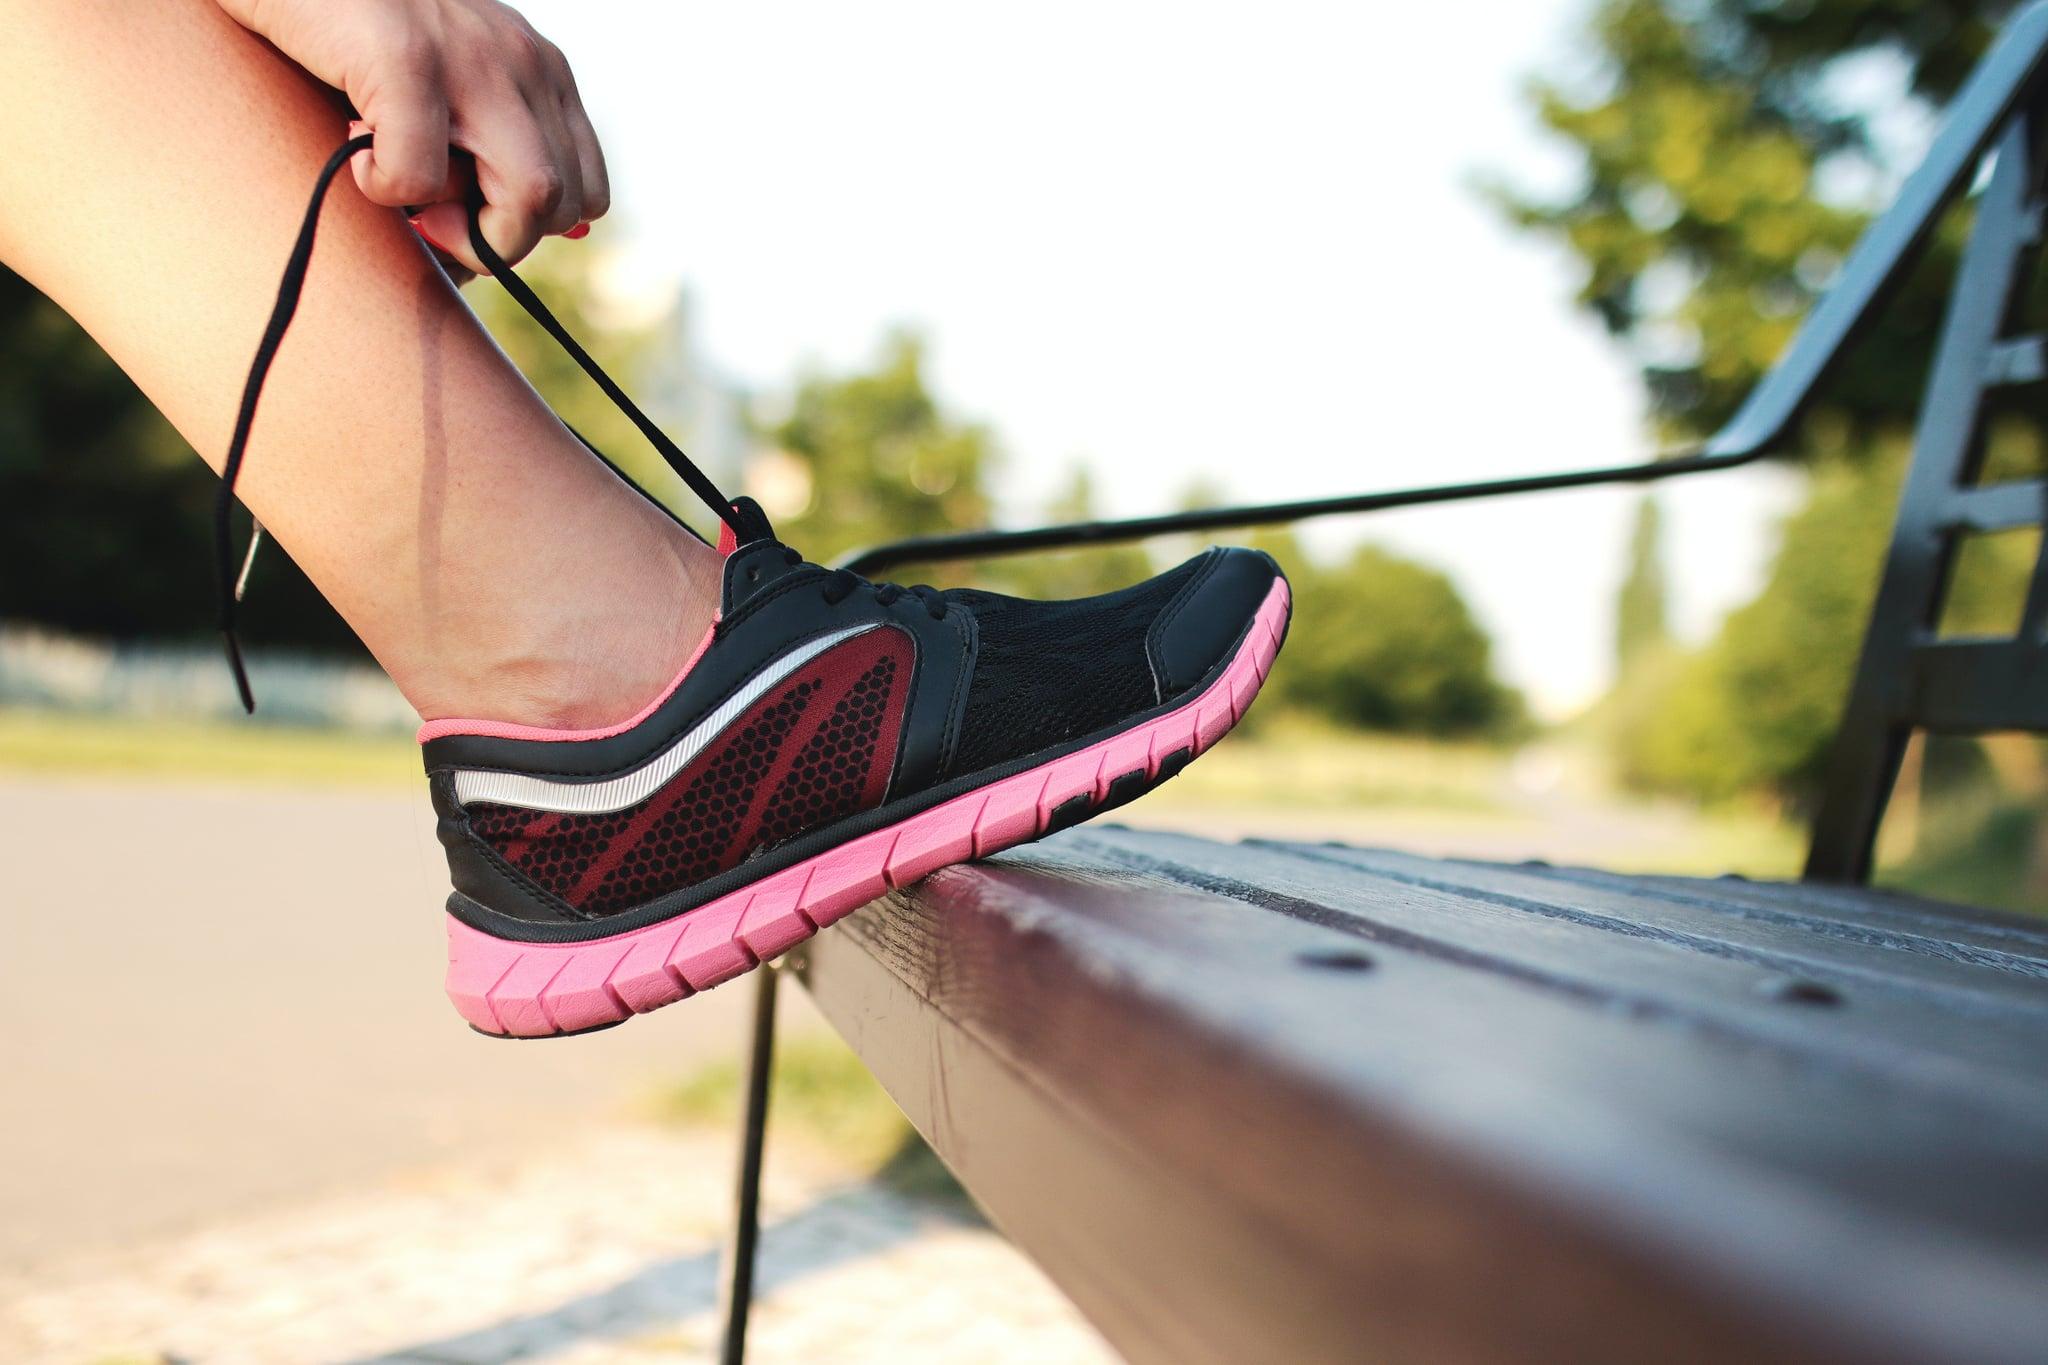 tmp_qjULMG_8ec95ed039ae96ea_exercise-hobby-jog-jogger-7432.jpg